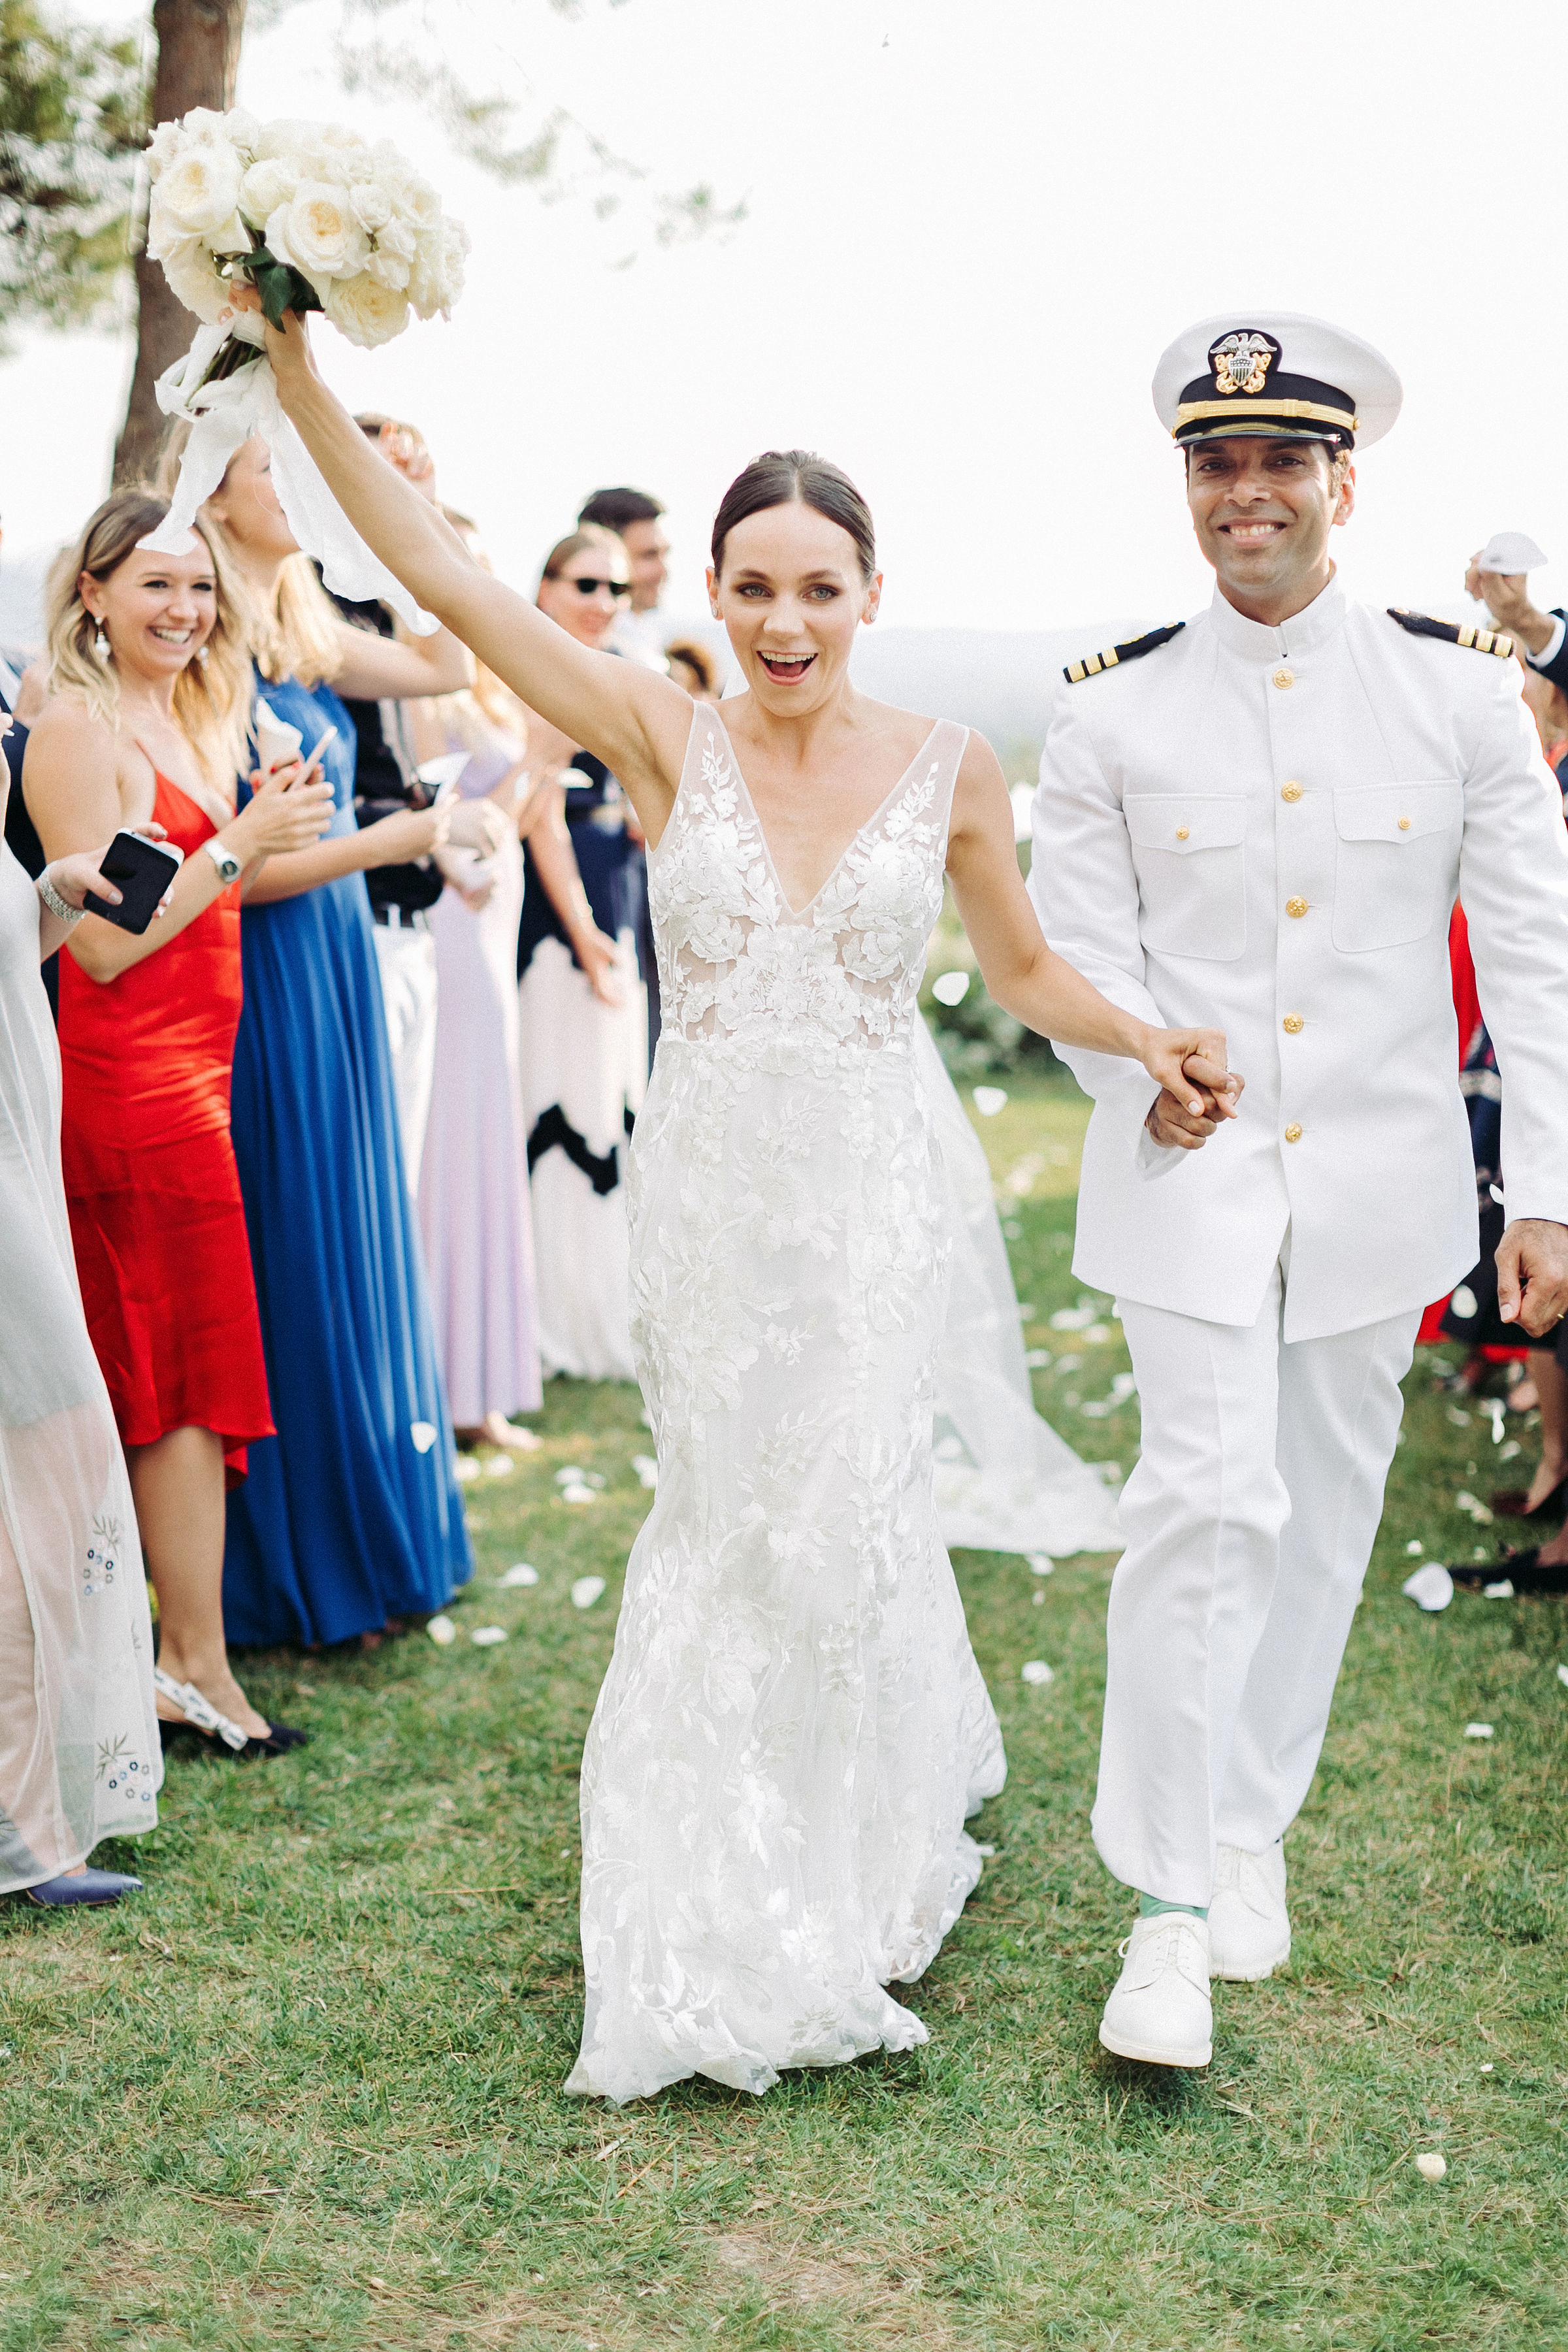 kseniya sadhir wedding recessional bride and groom